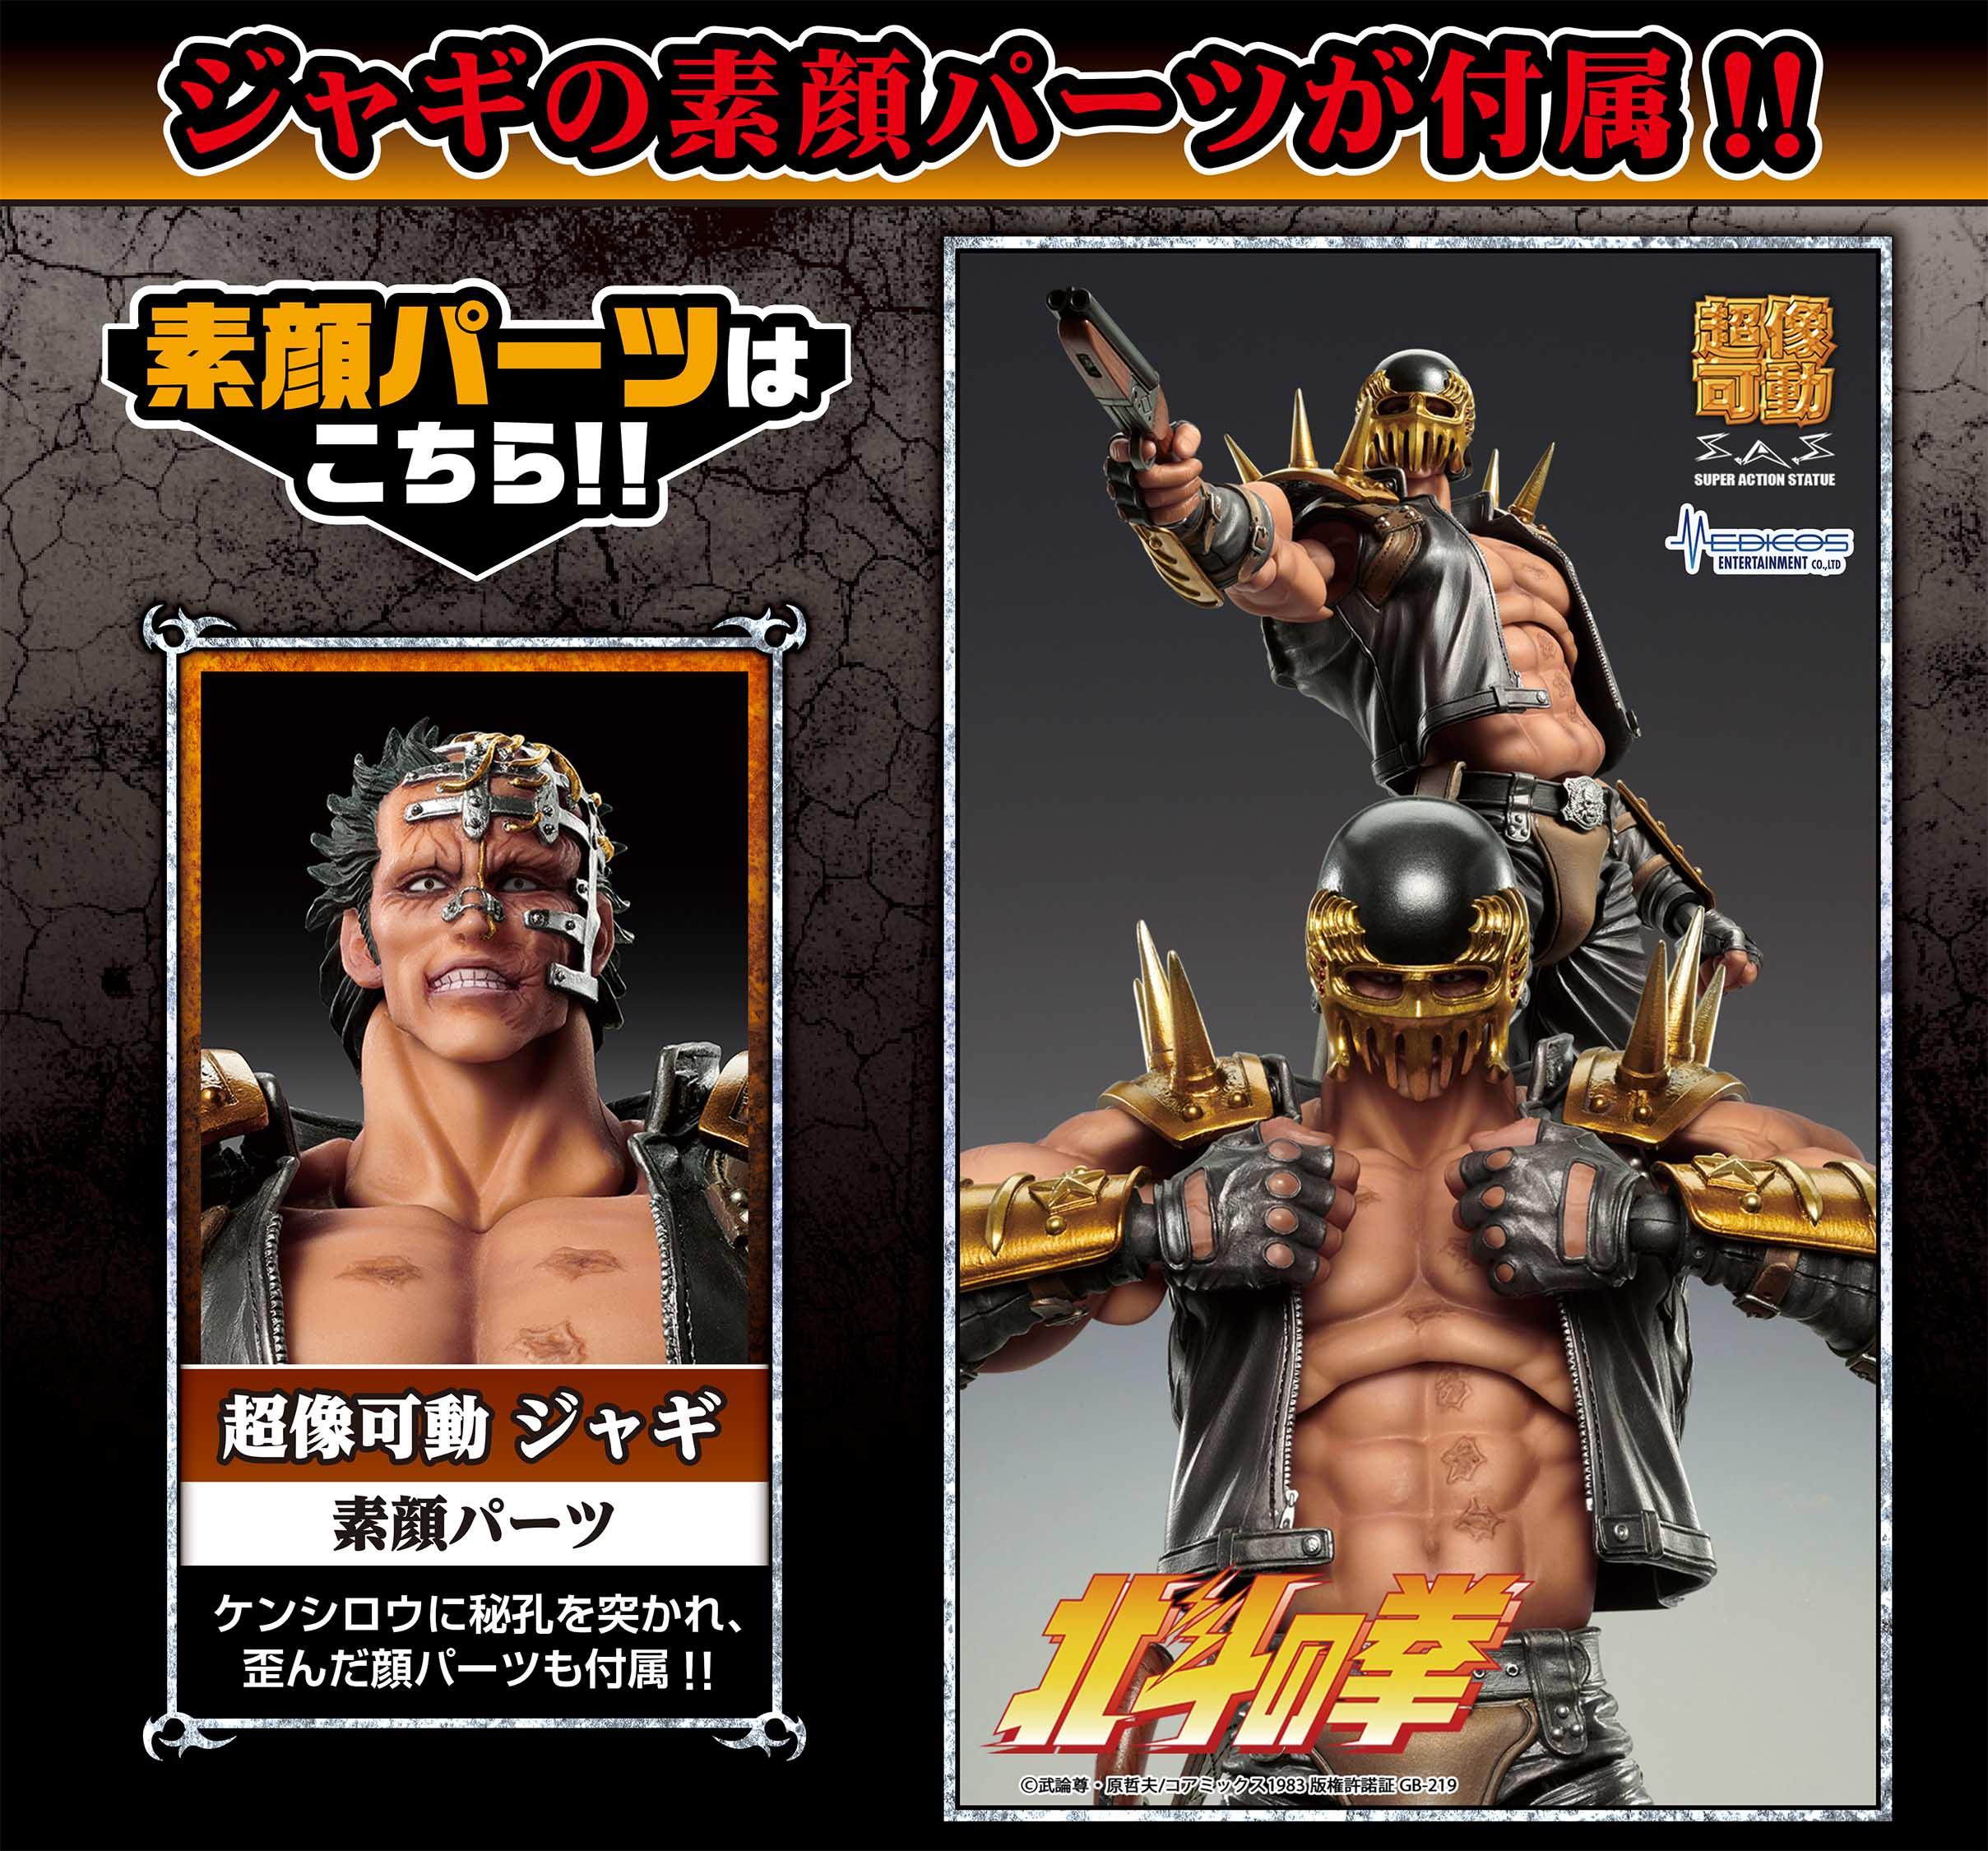 Medios超像可动《北斗神拳》贾基 售价8600日元